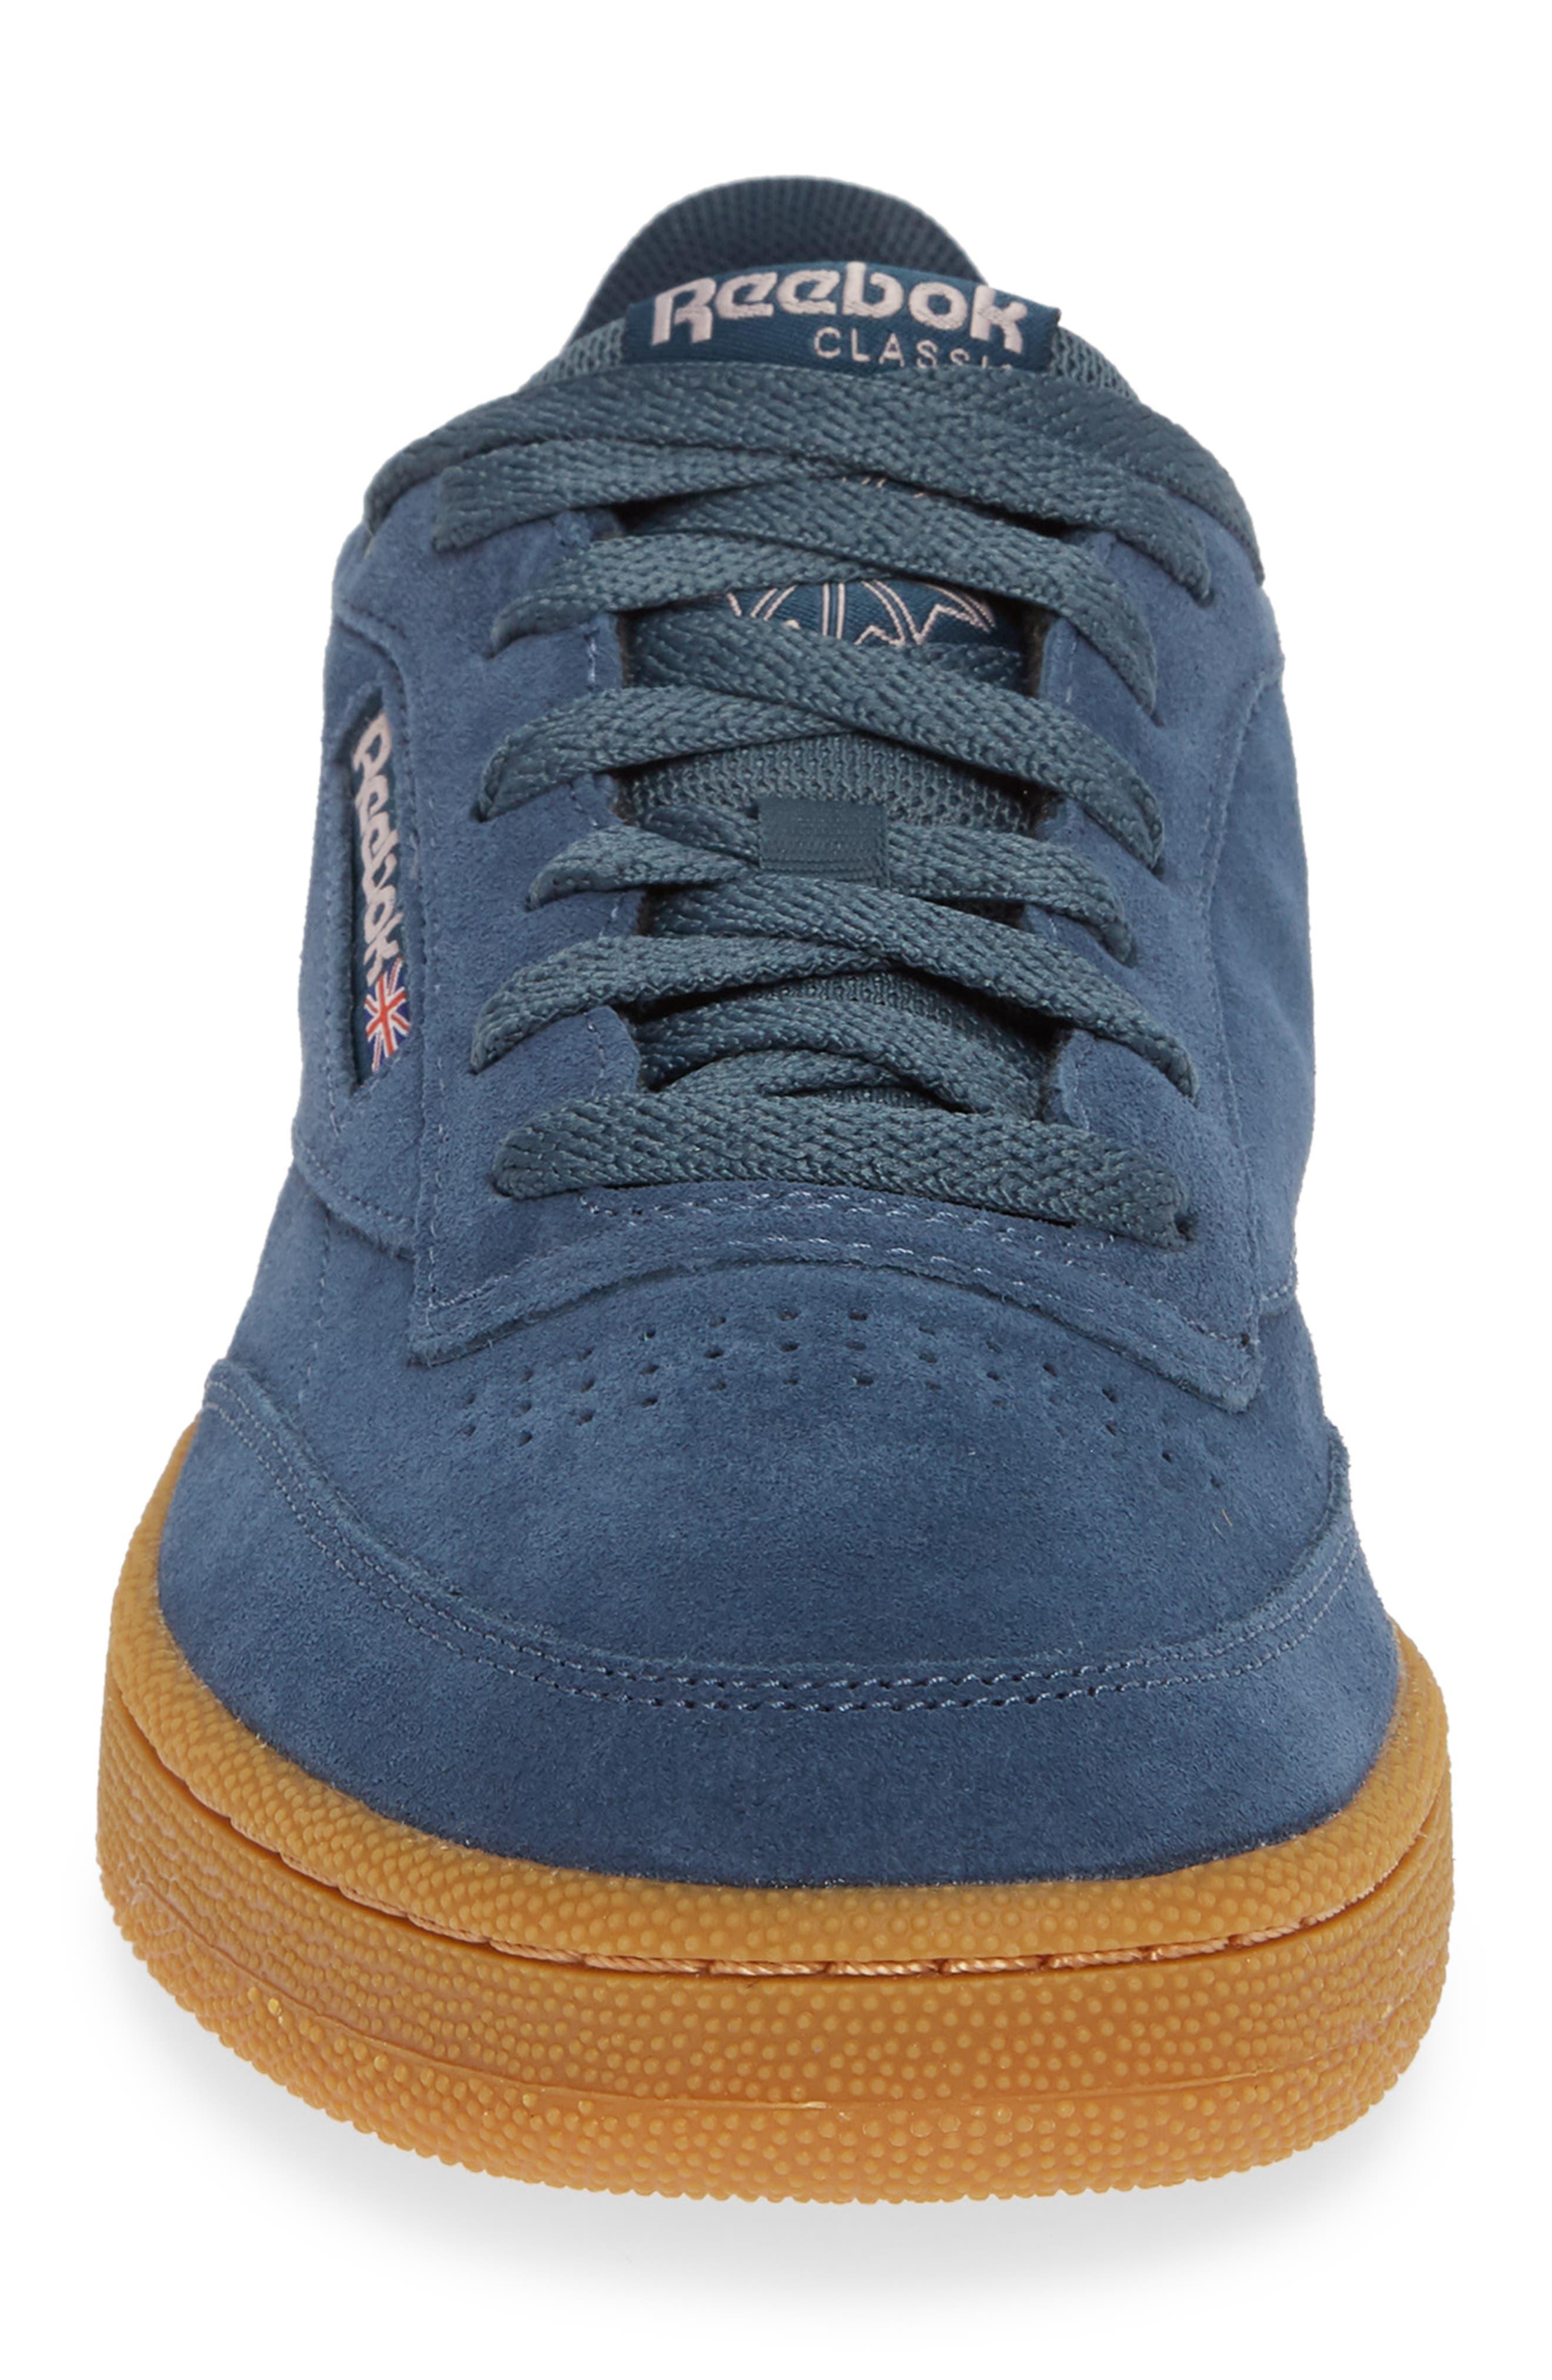 Club C 85 MU Sneaker,                             Alternate thumbnail 4, color,                             400